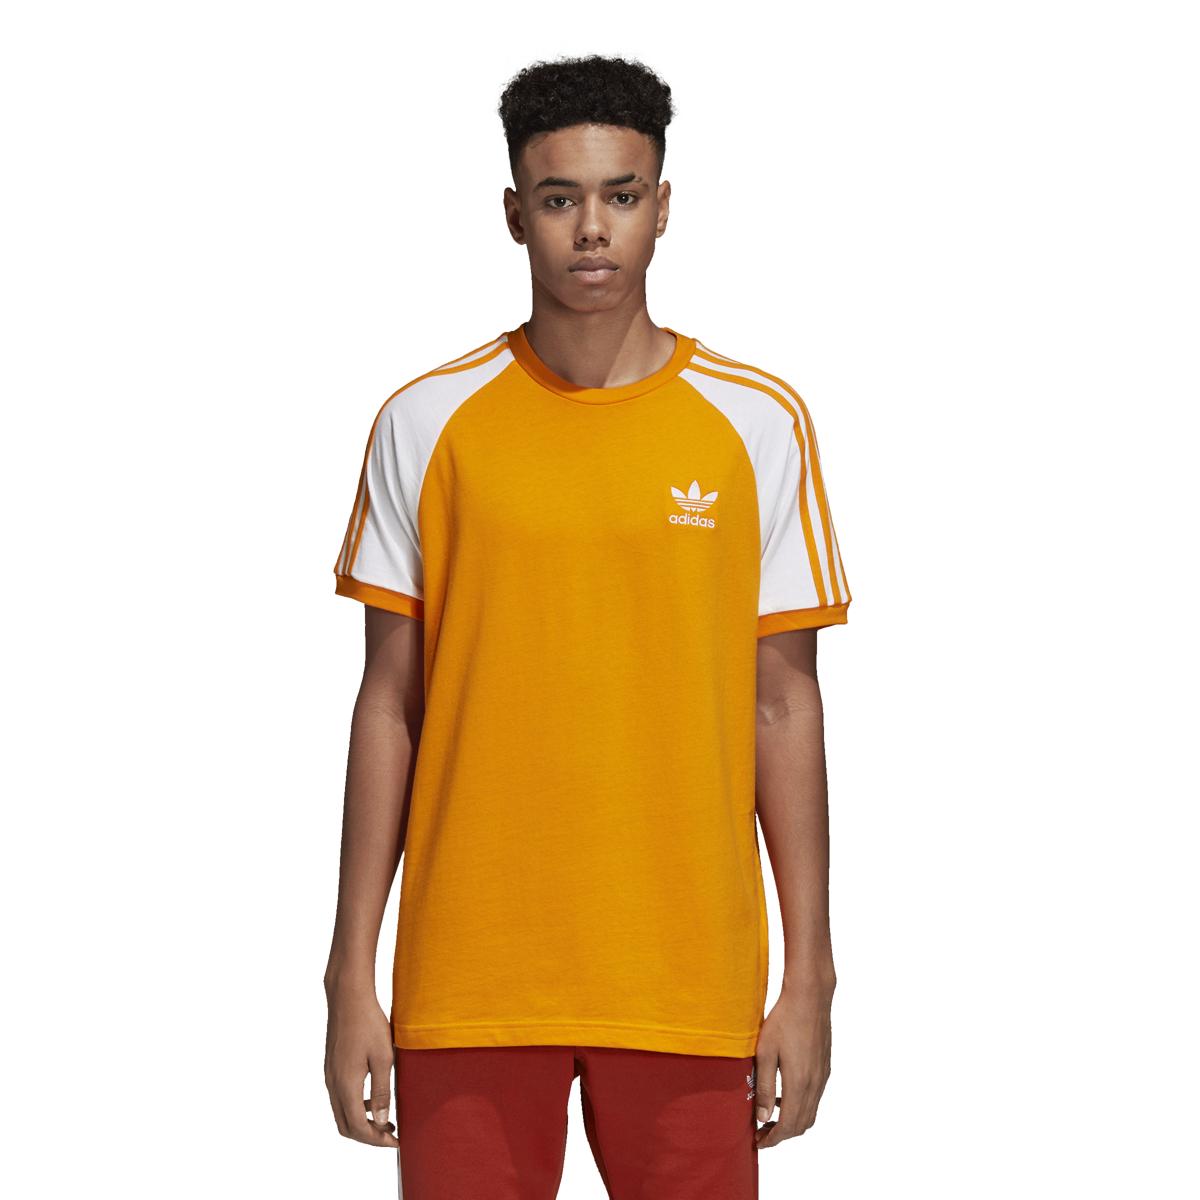 12cc5af05 Adidas Men's Originals 3-Stripes Tee Bright Orange DH5809   eBay